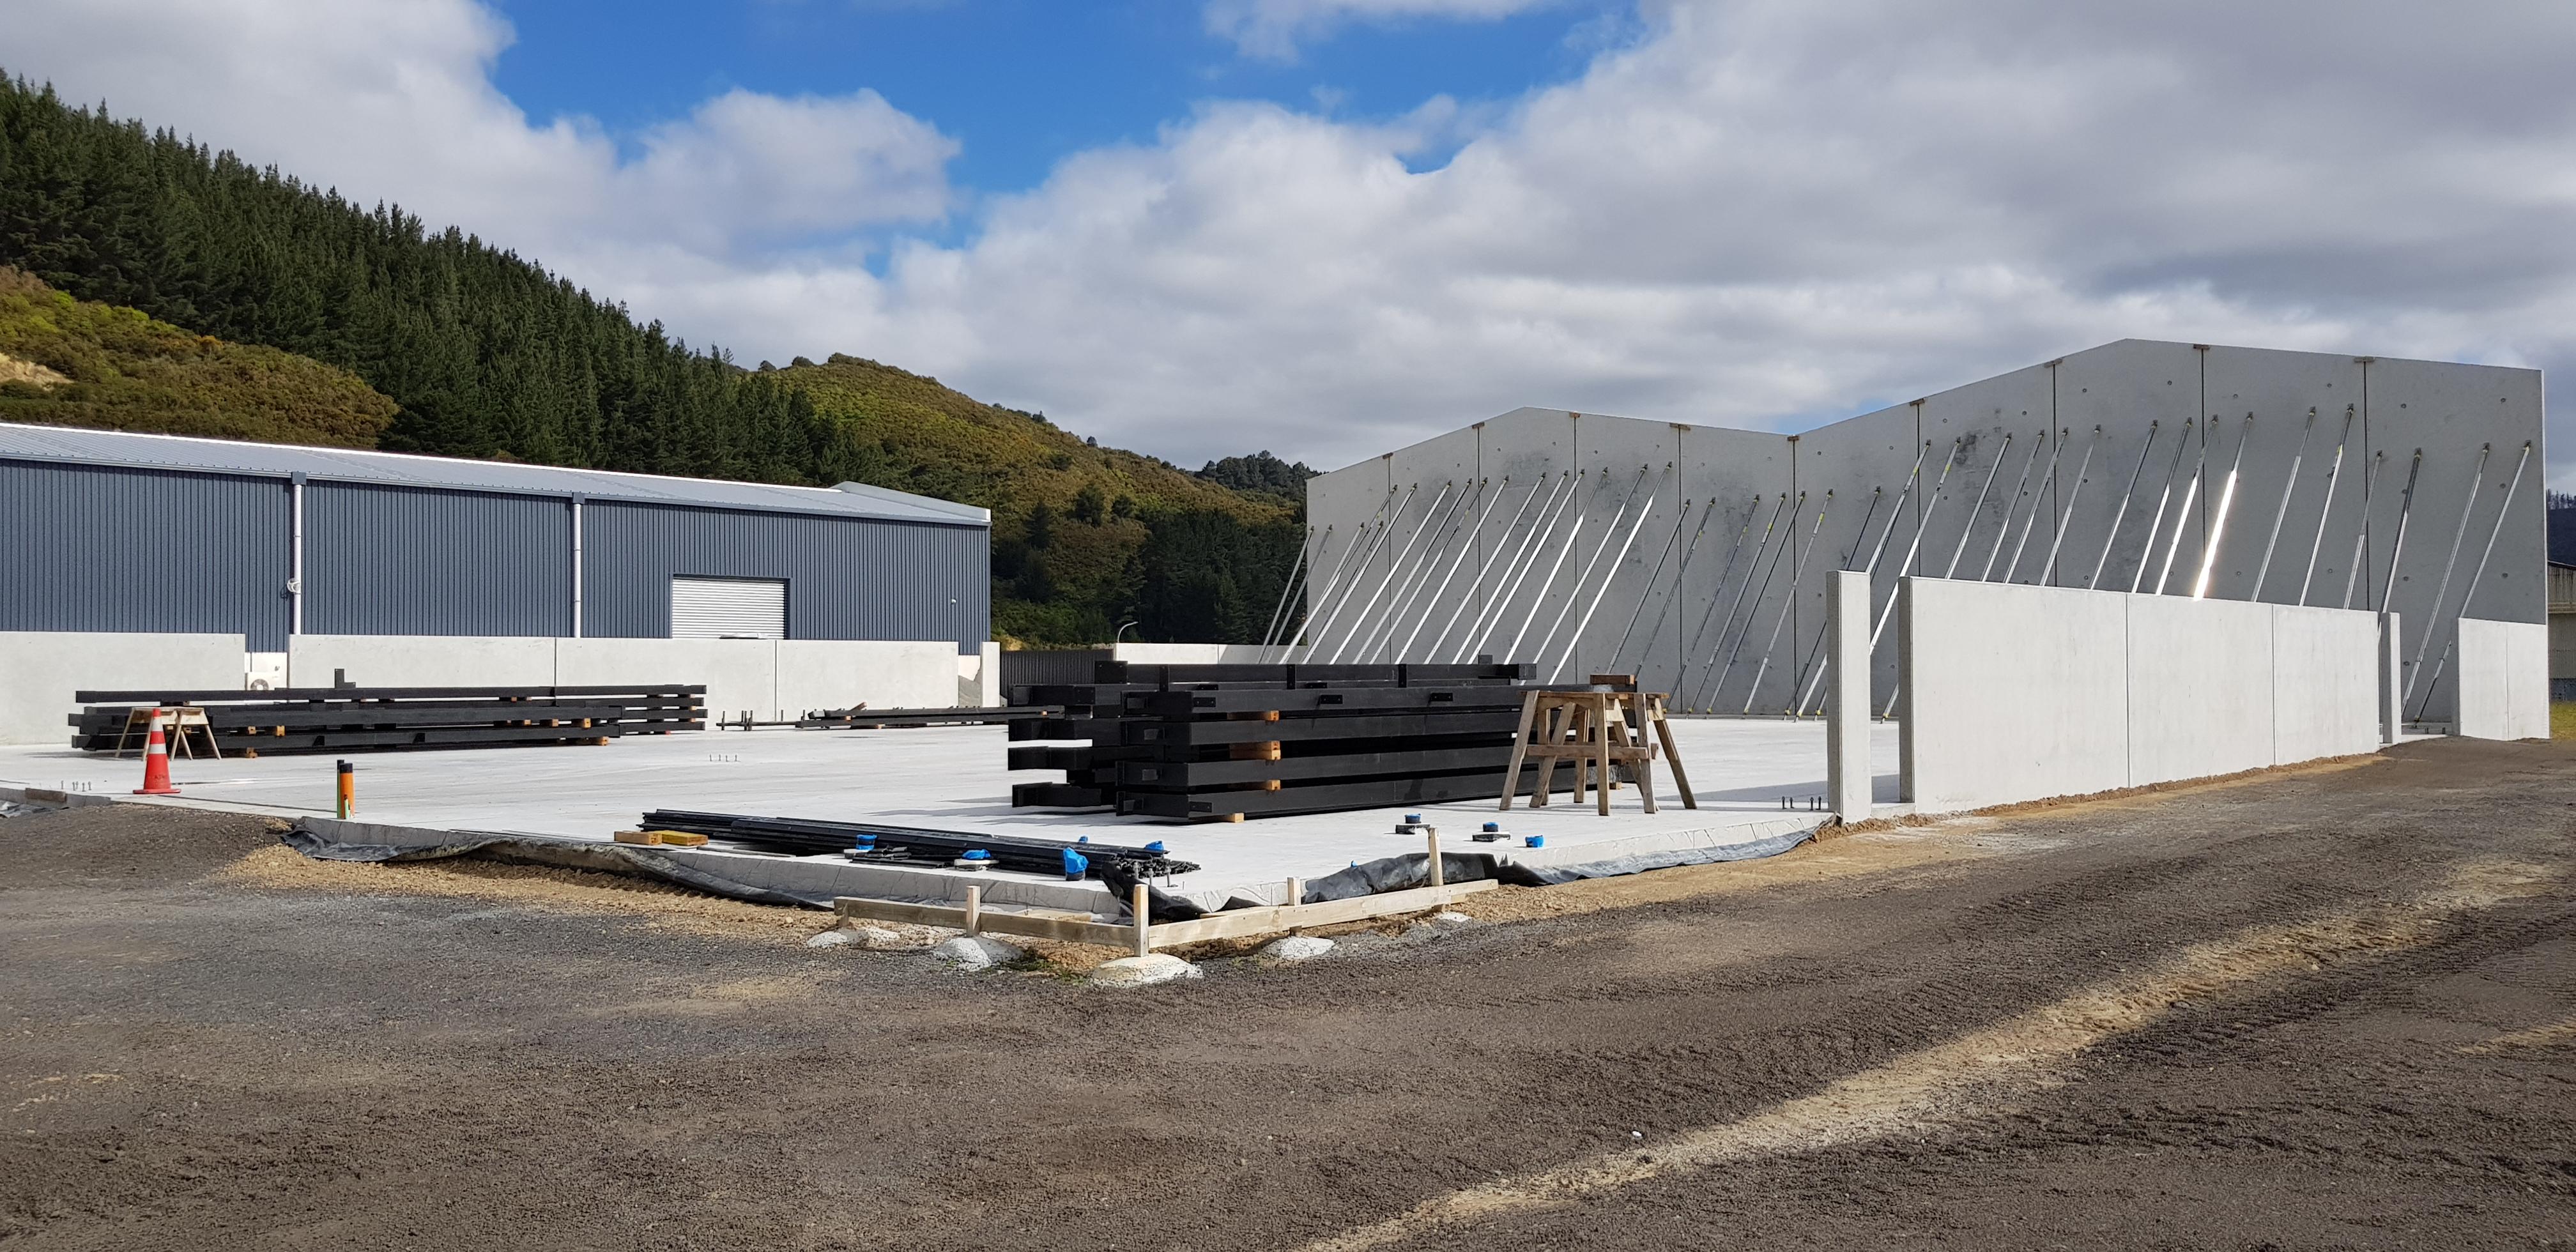 Load bearing steel reinforced fibre slab by Inforce in action